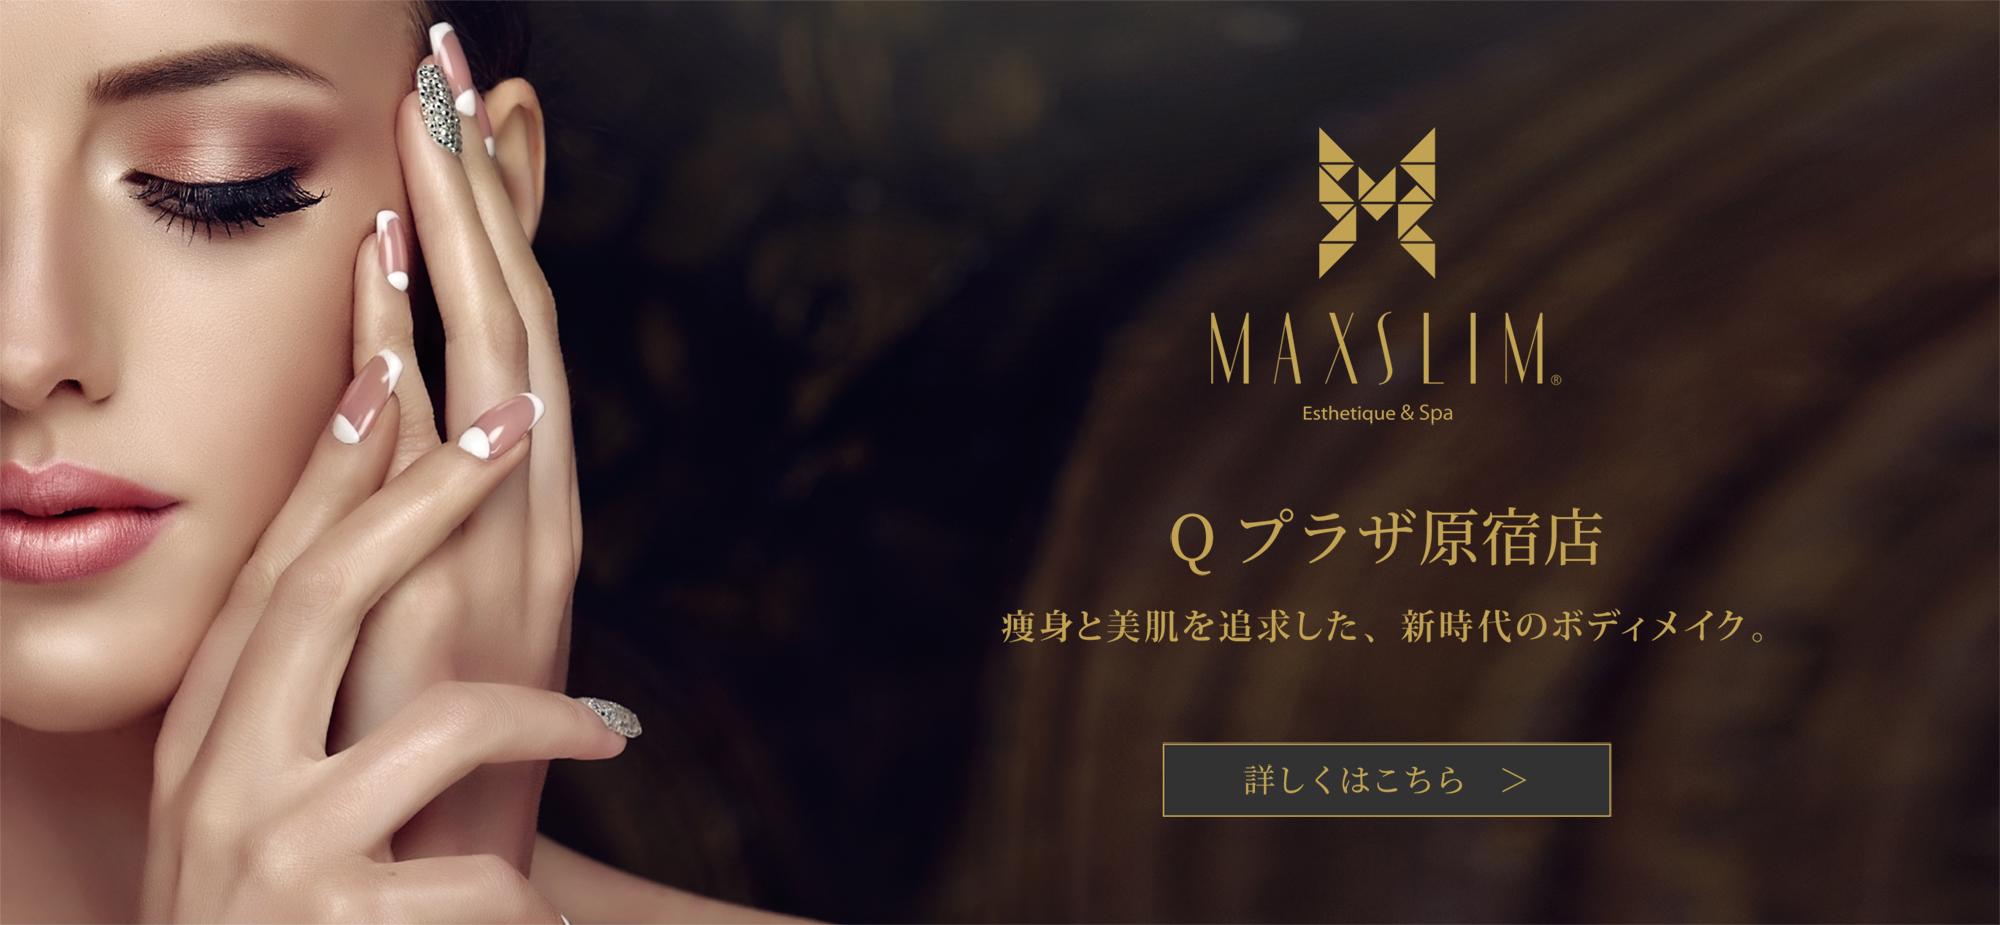 MAXSLIM Qプラザ原宿店 痩身と美肌を追求した、新時代のボディメイク。